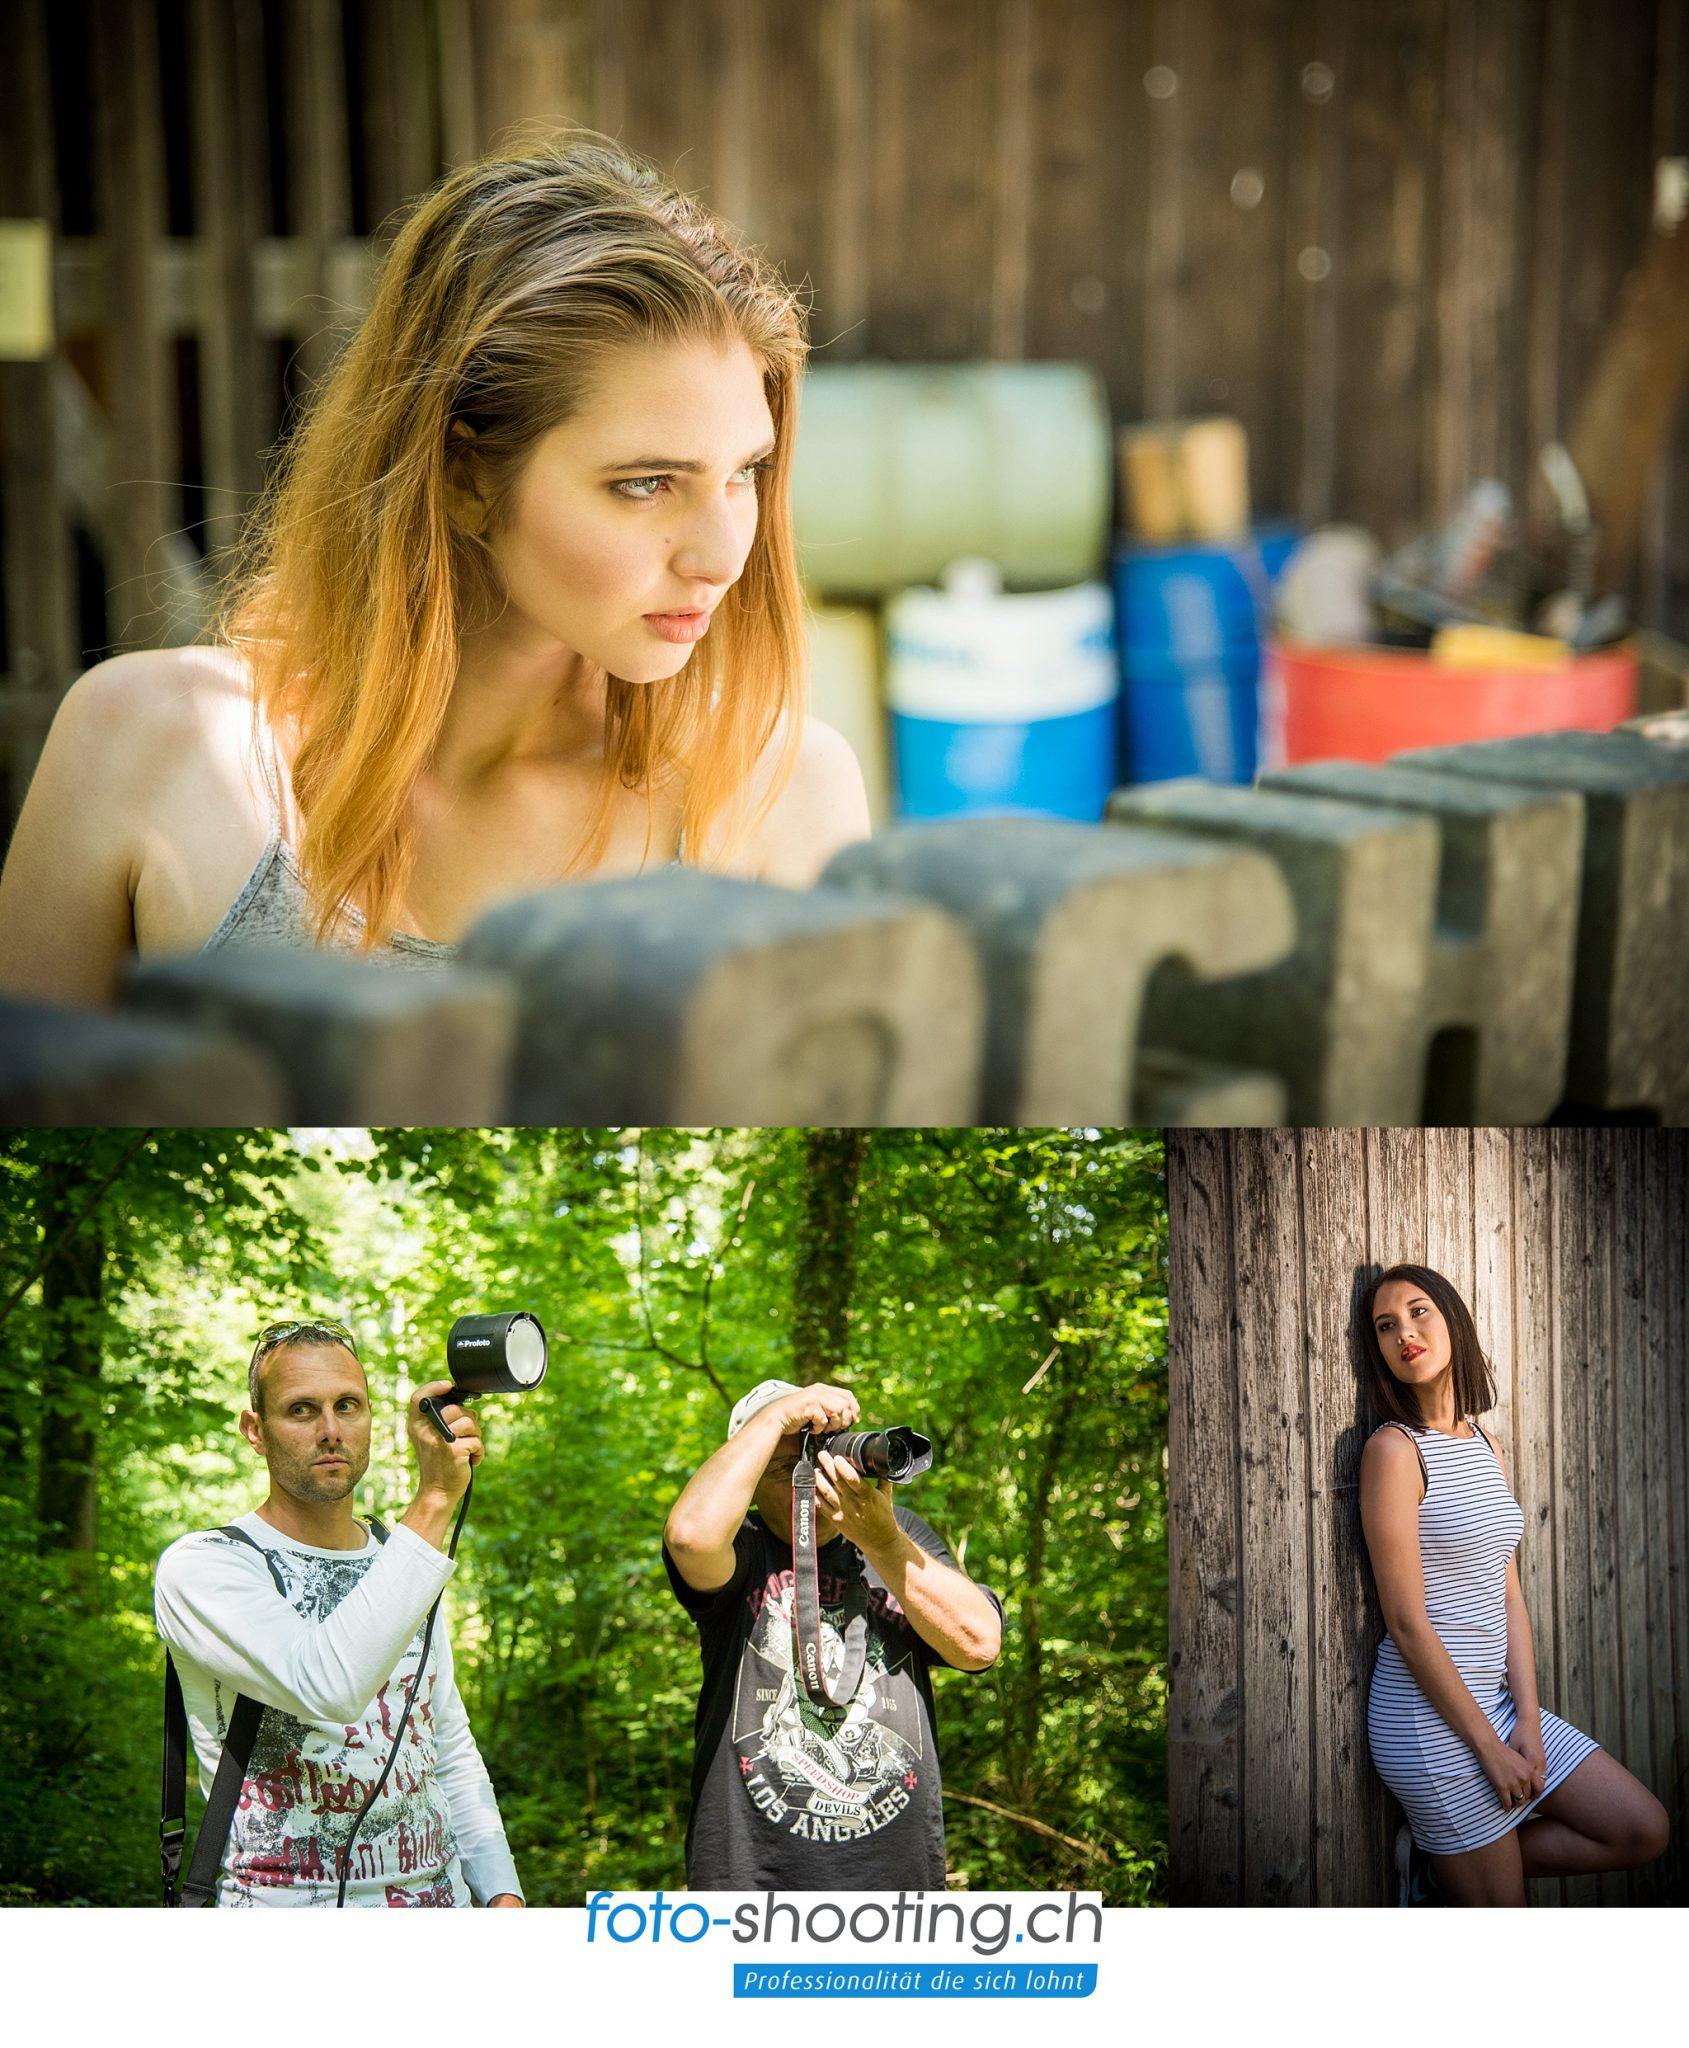 fotoshooting_fotograf_model_fotostudio_zuerich_ostschweiz_0411